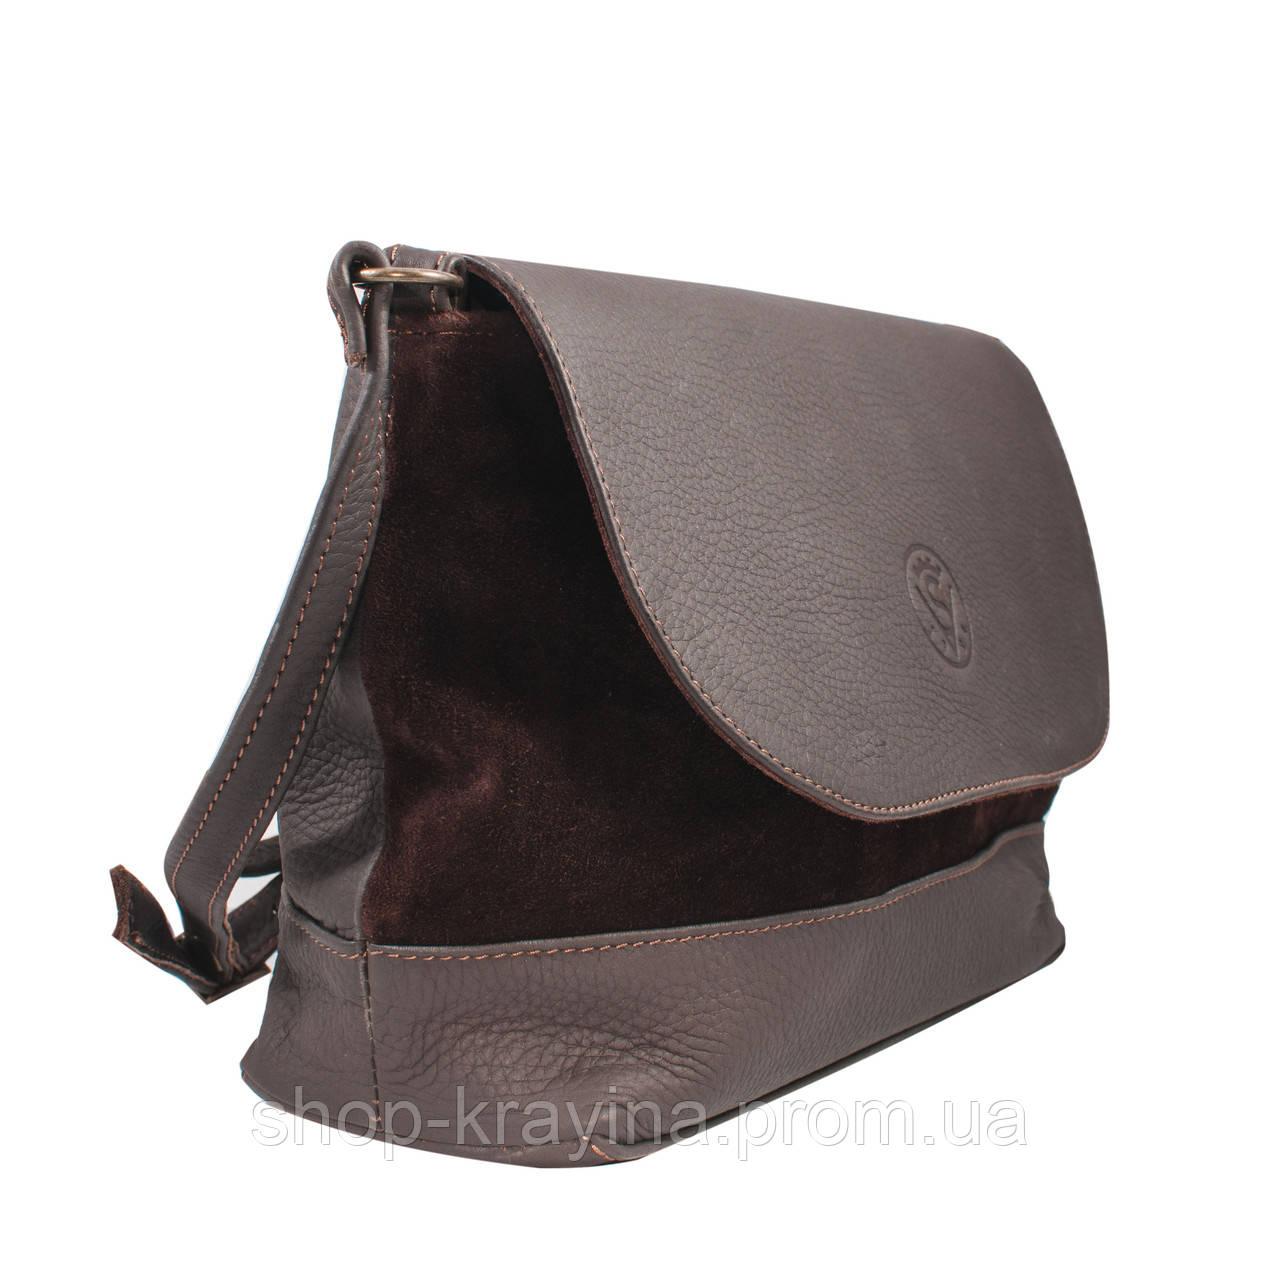 Кожаная сумка VS238 brown suede 27х23х9 см